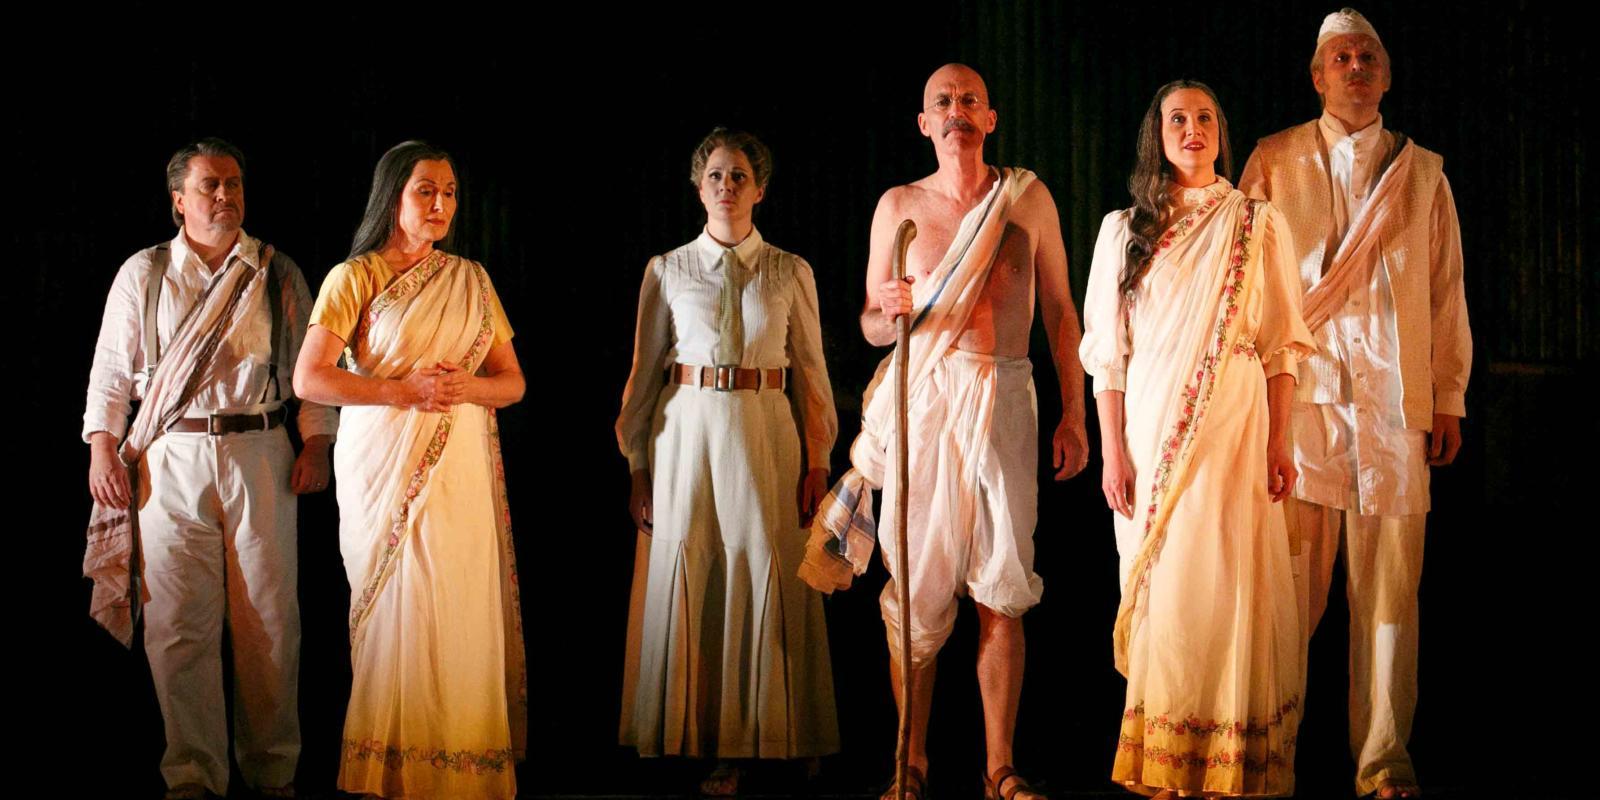 An image of Nicholas Folwell, Janis Kelly, Clare Eggington, Alan Oke, Stephanie Marshall and Nicholas Masters in Phelim McDermott's 2013 production of Satyagraha